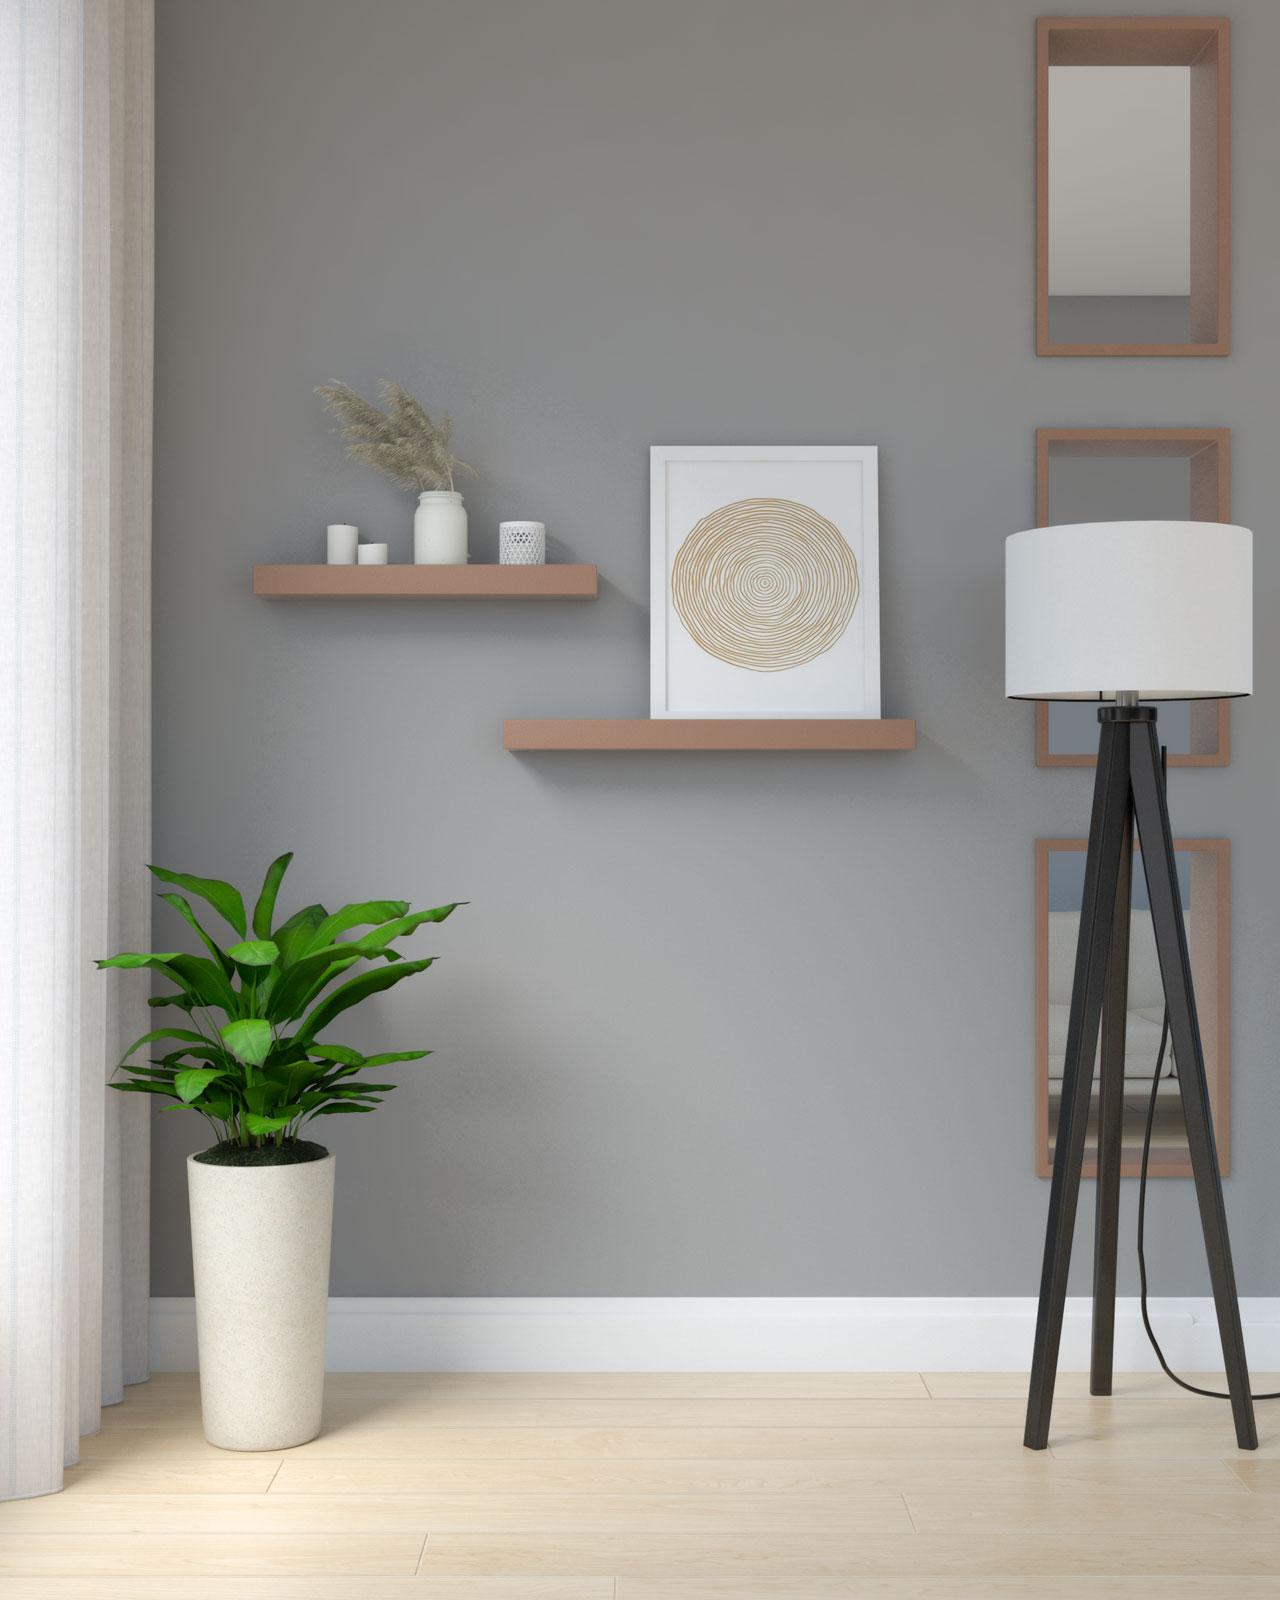 Brown shelves on gray walls